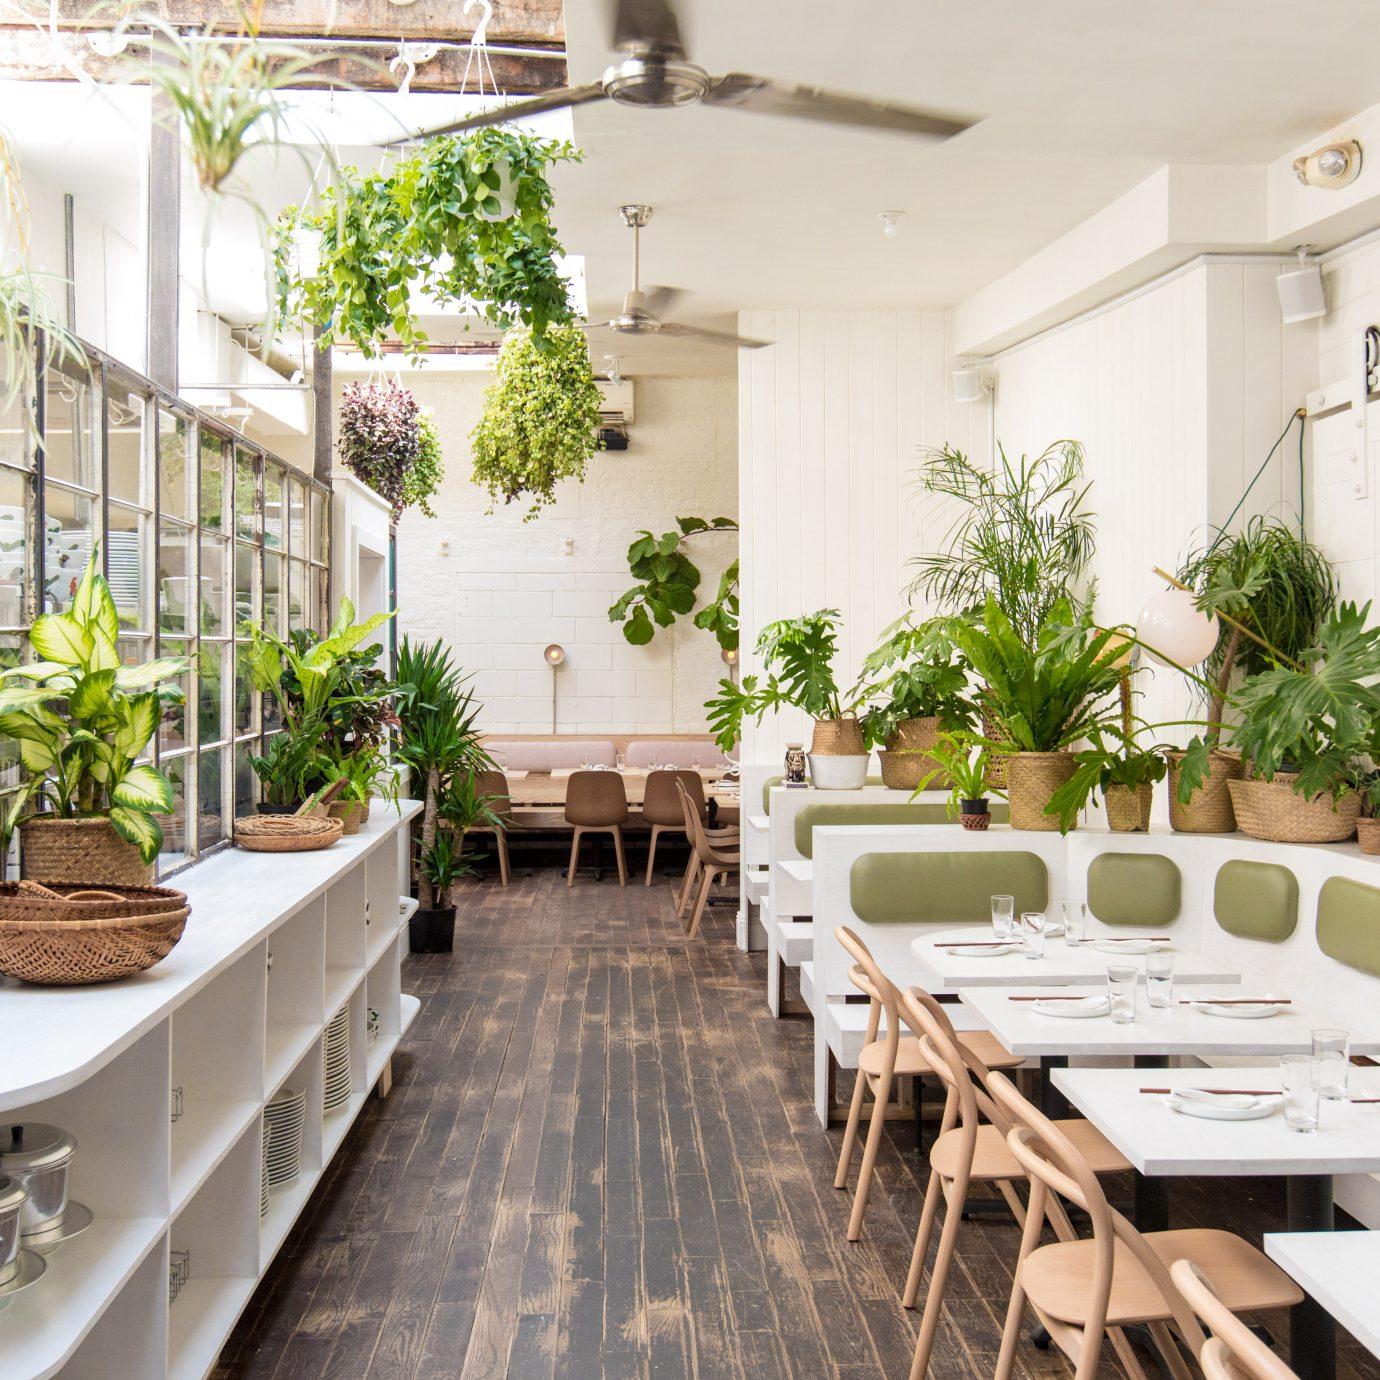 Interior at Đi Ăn Đi, Best New Restaurants in NYC